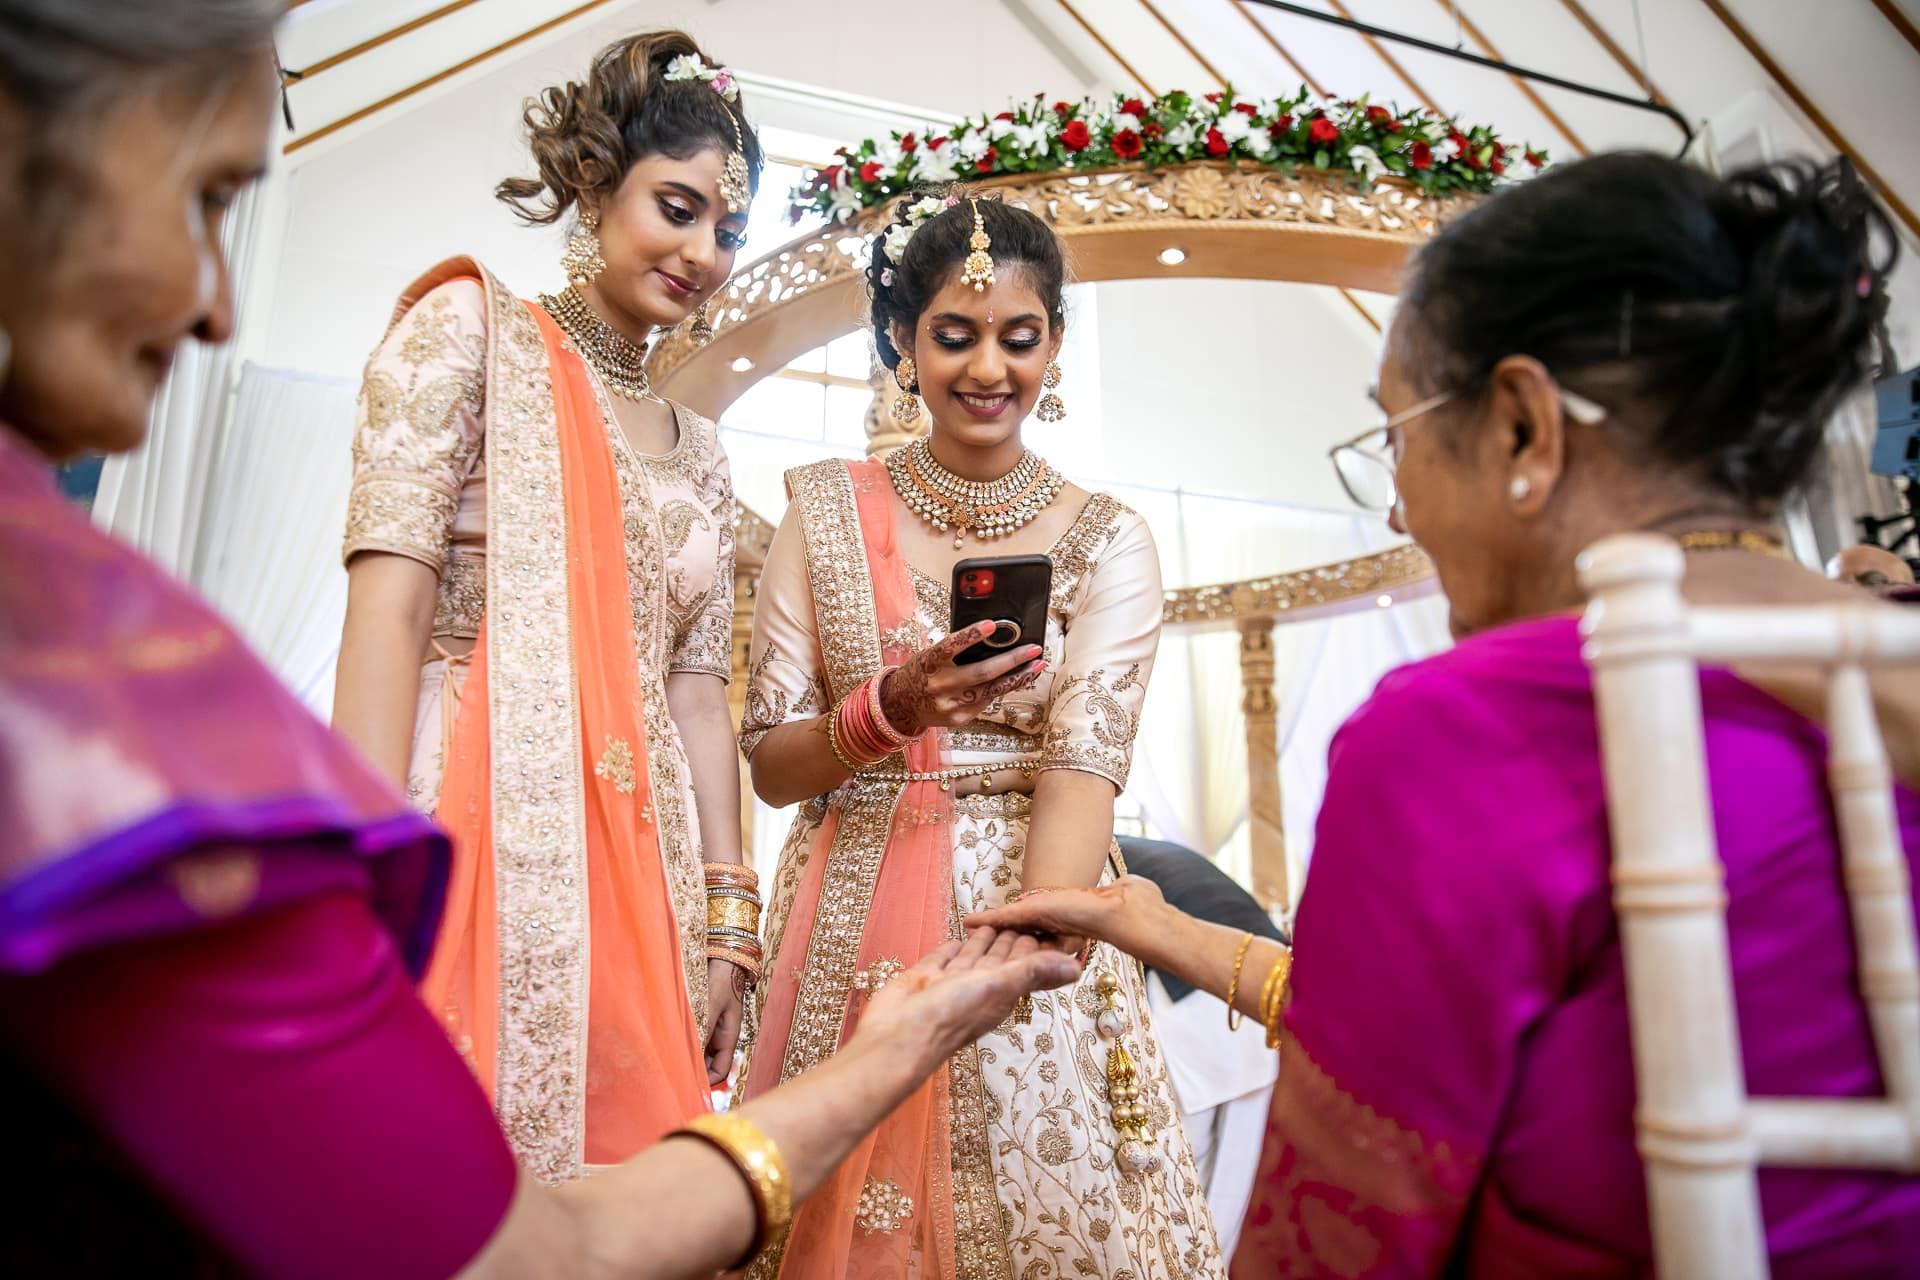 Hindu wedding guests at The Haveli, Bhaktivedata Manir